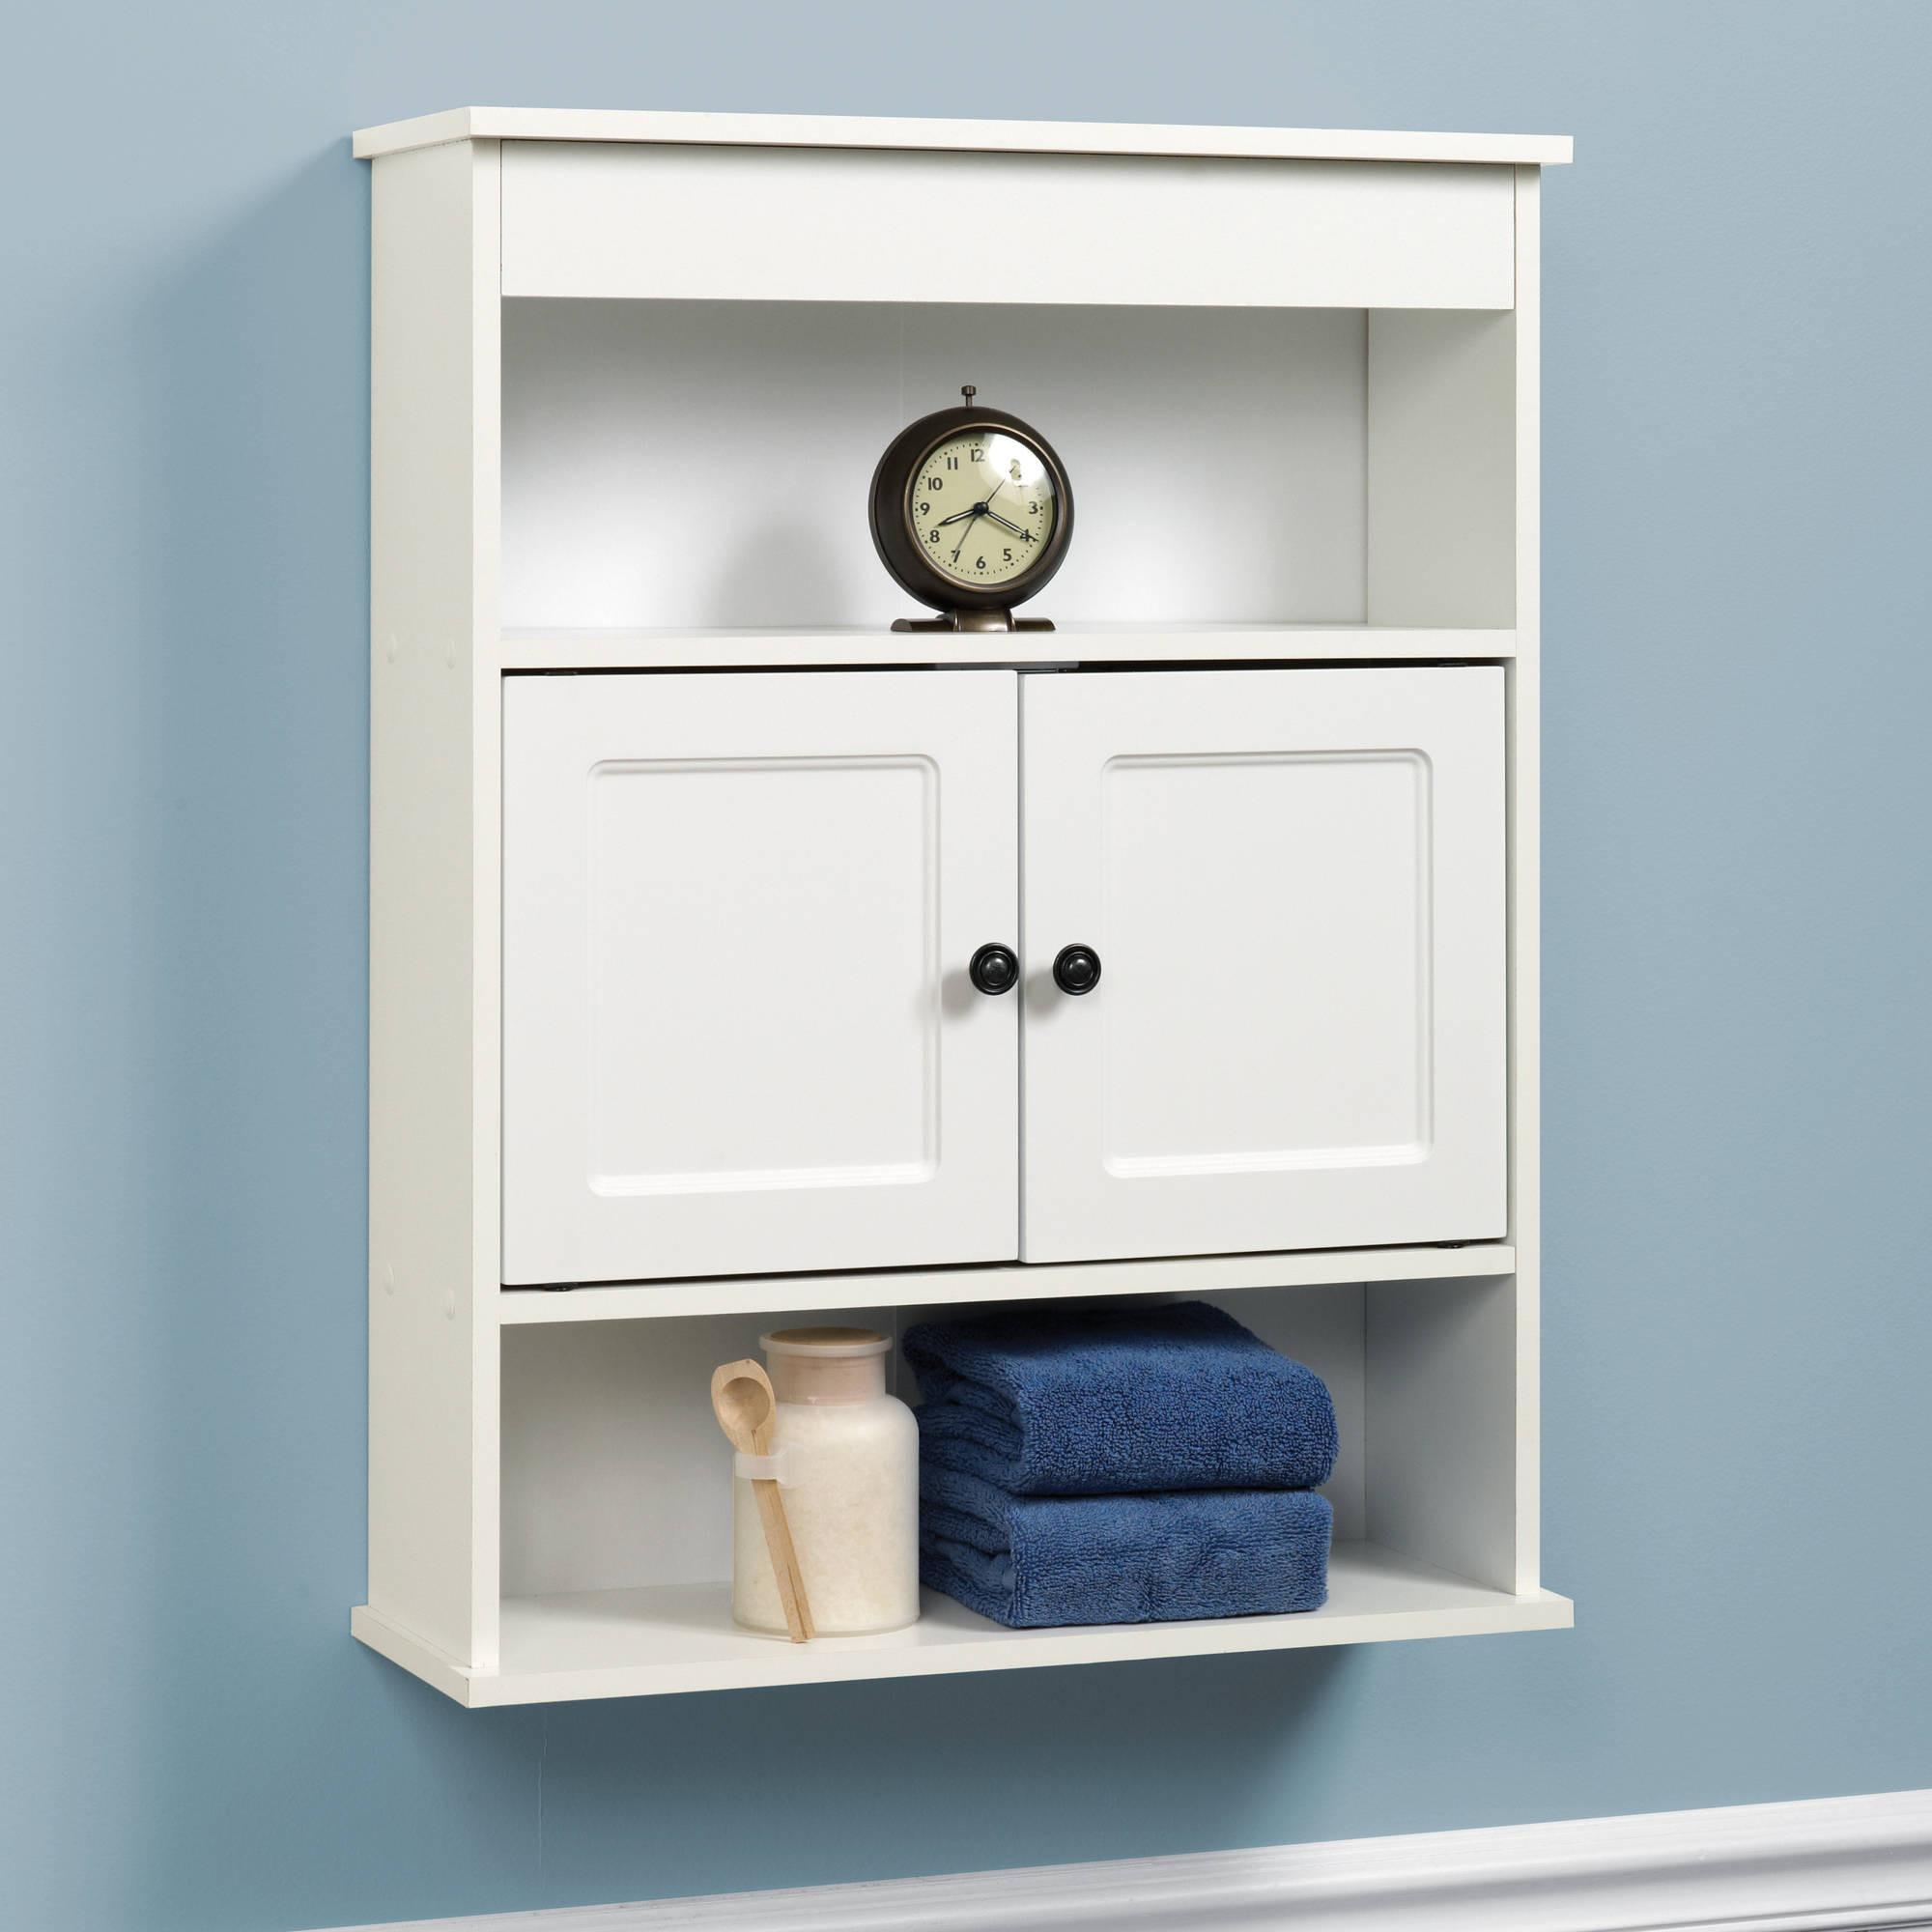 Best ideas about Bathroom Cabinet Storage . Save or Pin Cabinet Wall Bathroom Storage White Shelf Organizer Over Now.